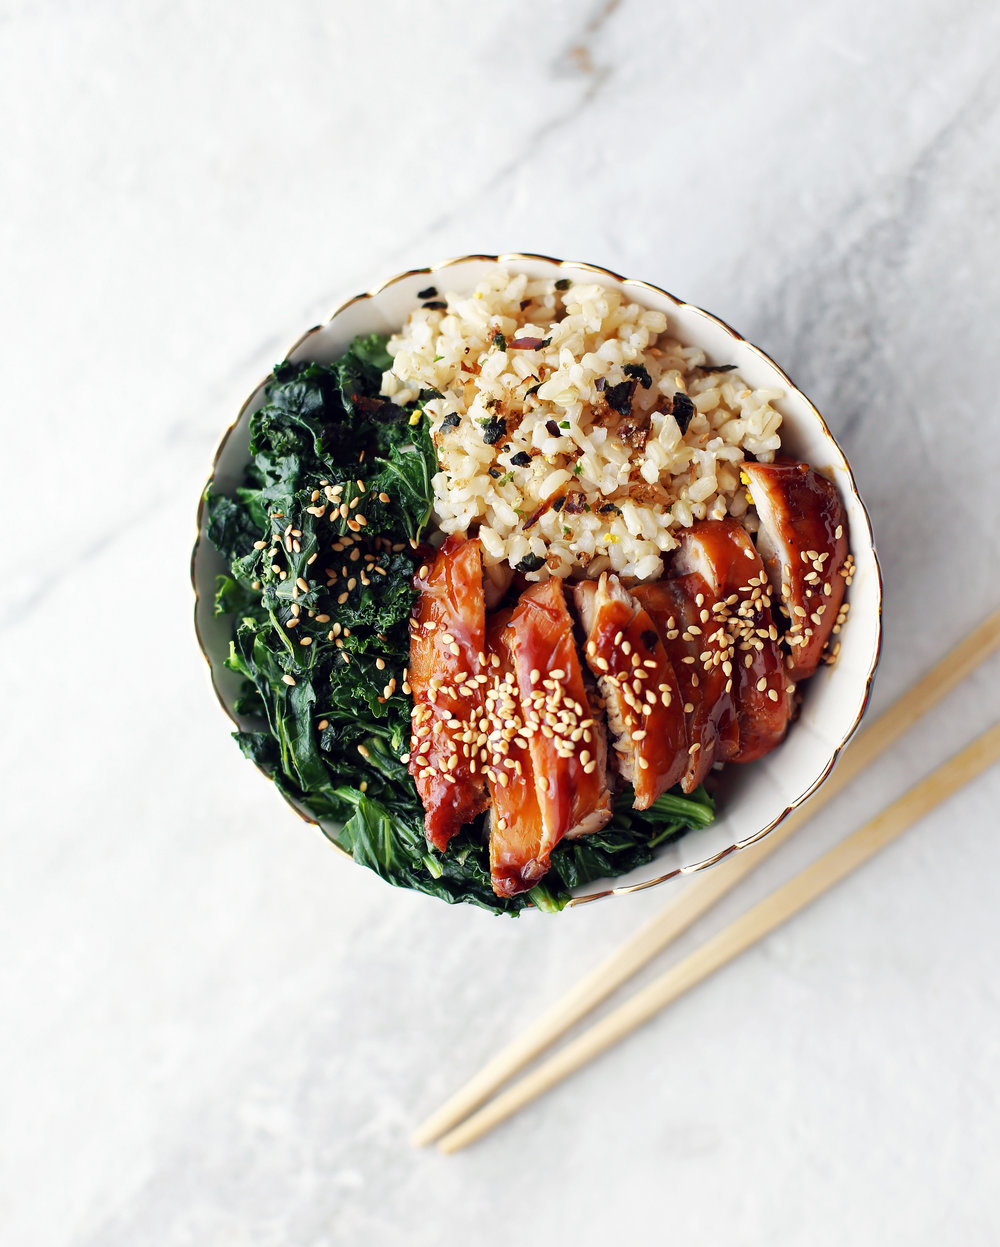 teriyaki-chicken-rice-bowl.jpg